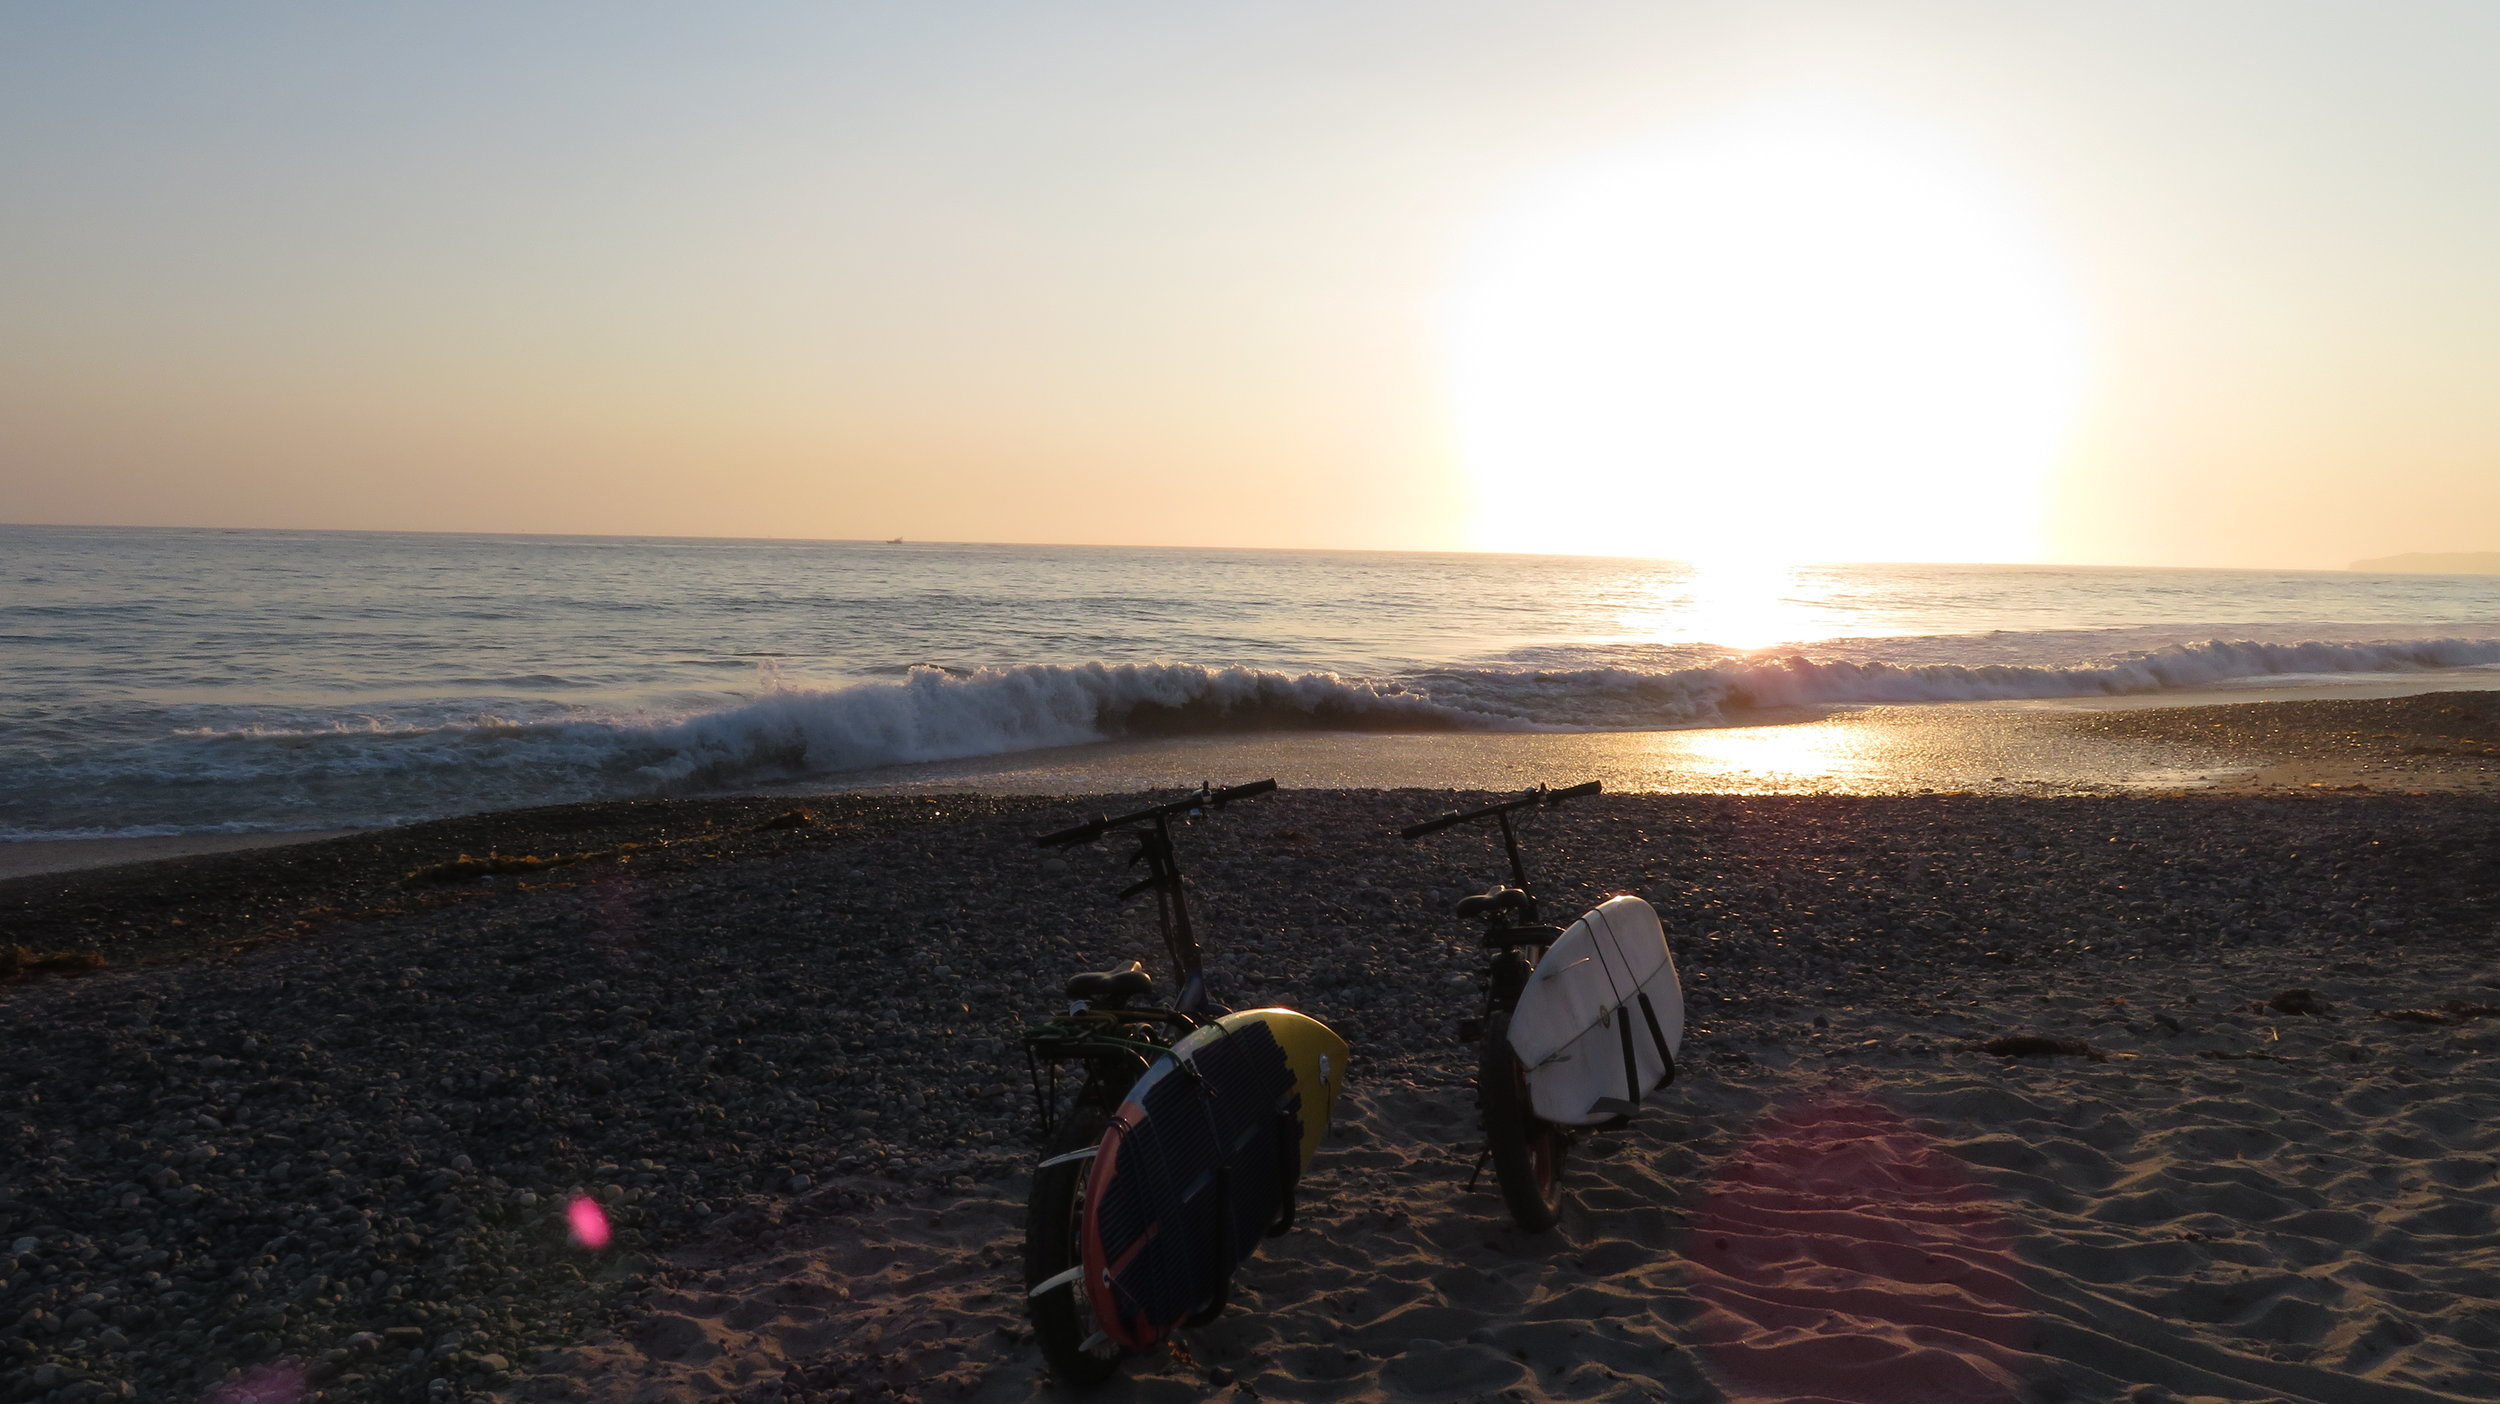 STG Excursion SEA Bikes water ocean Ali Surf surfing IMG_0338 (1).JPG